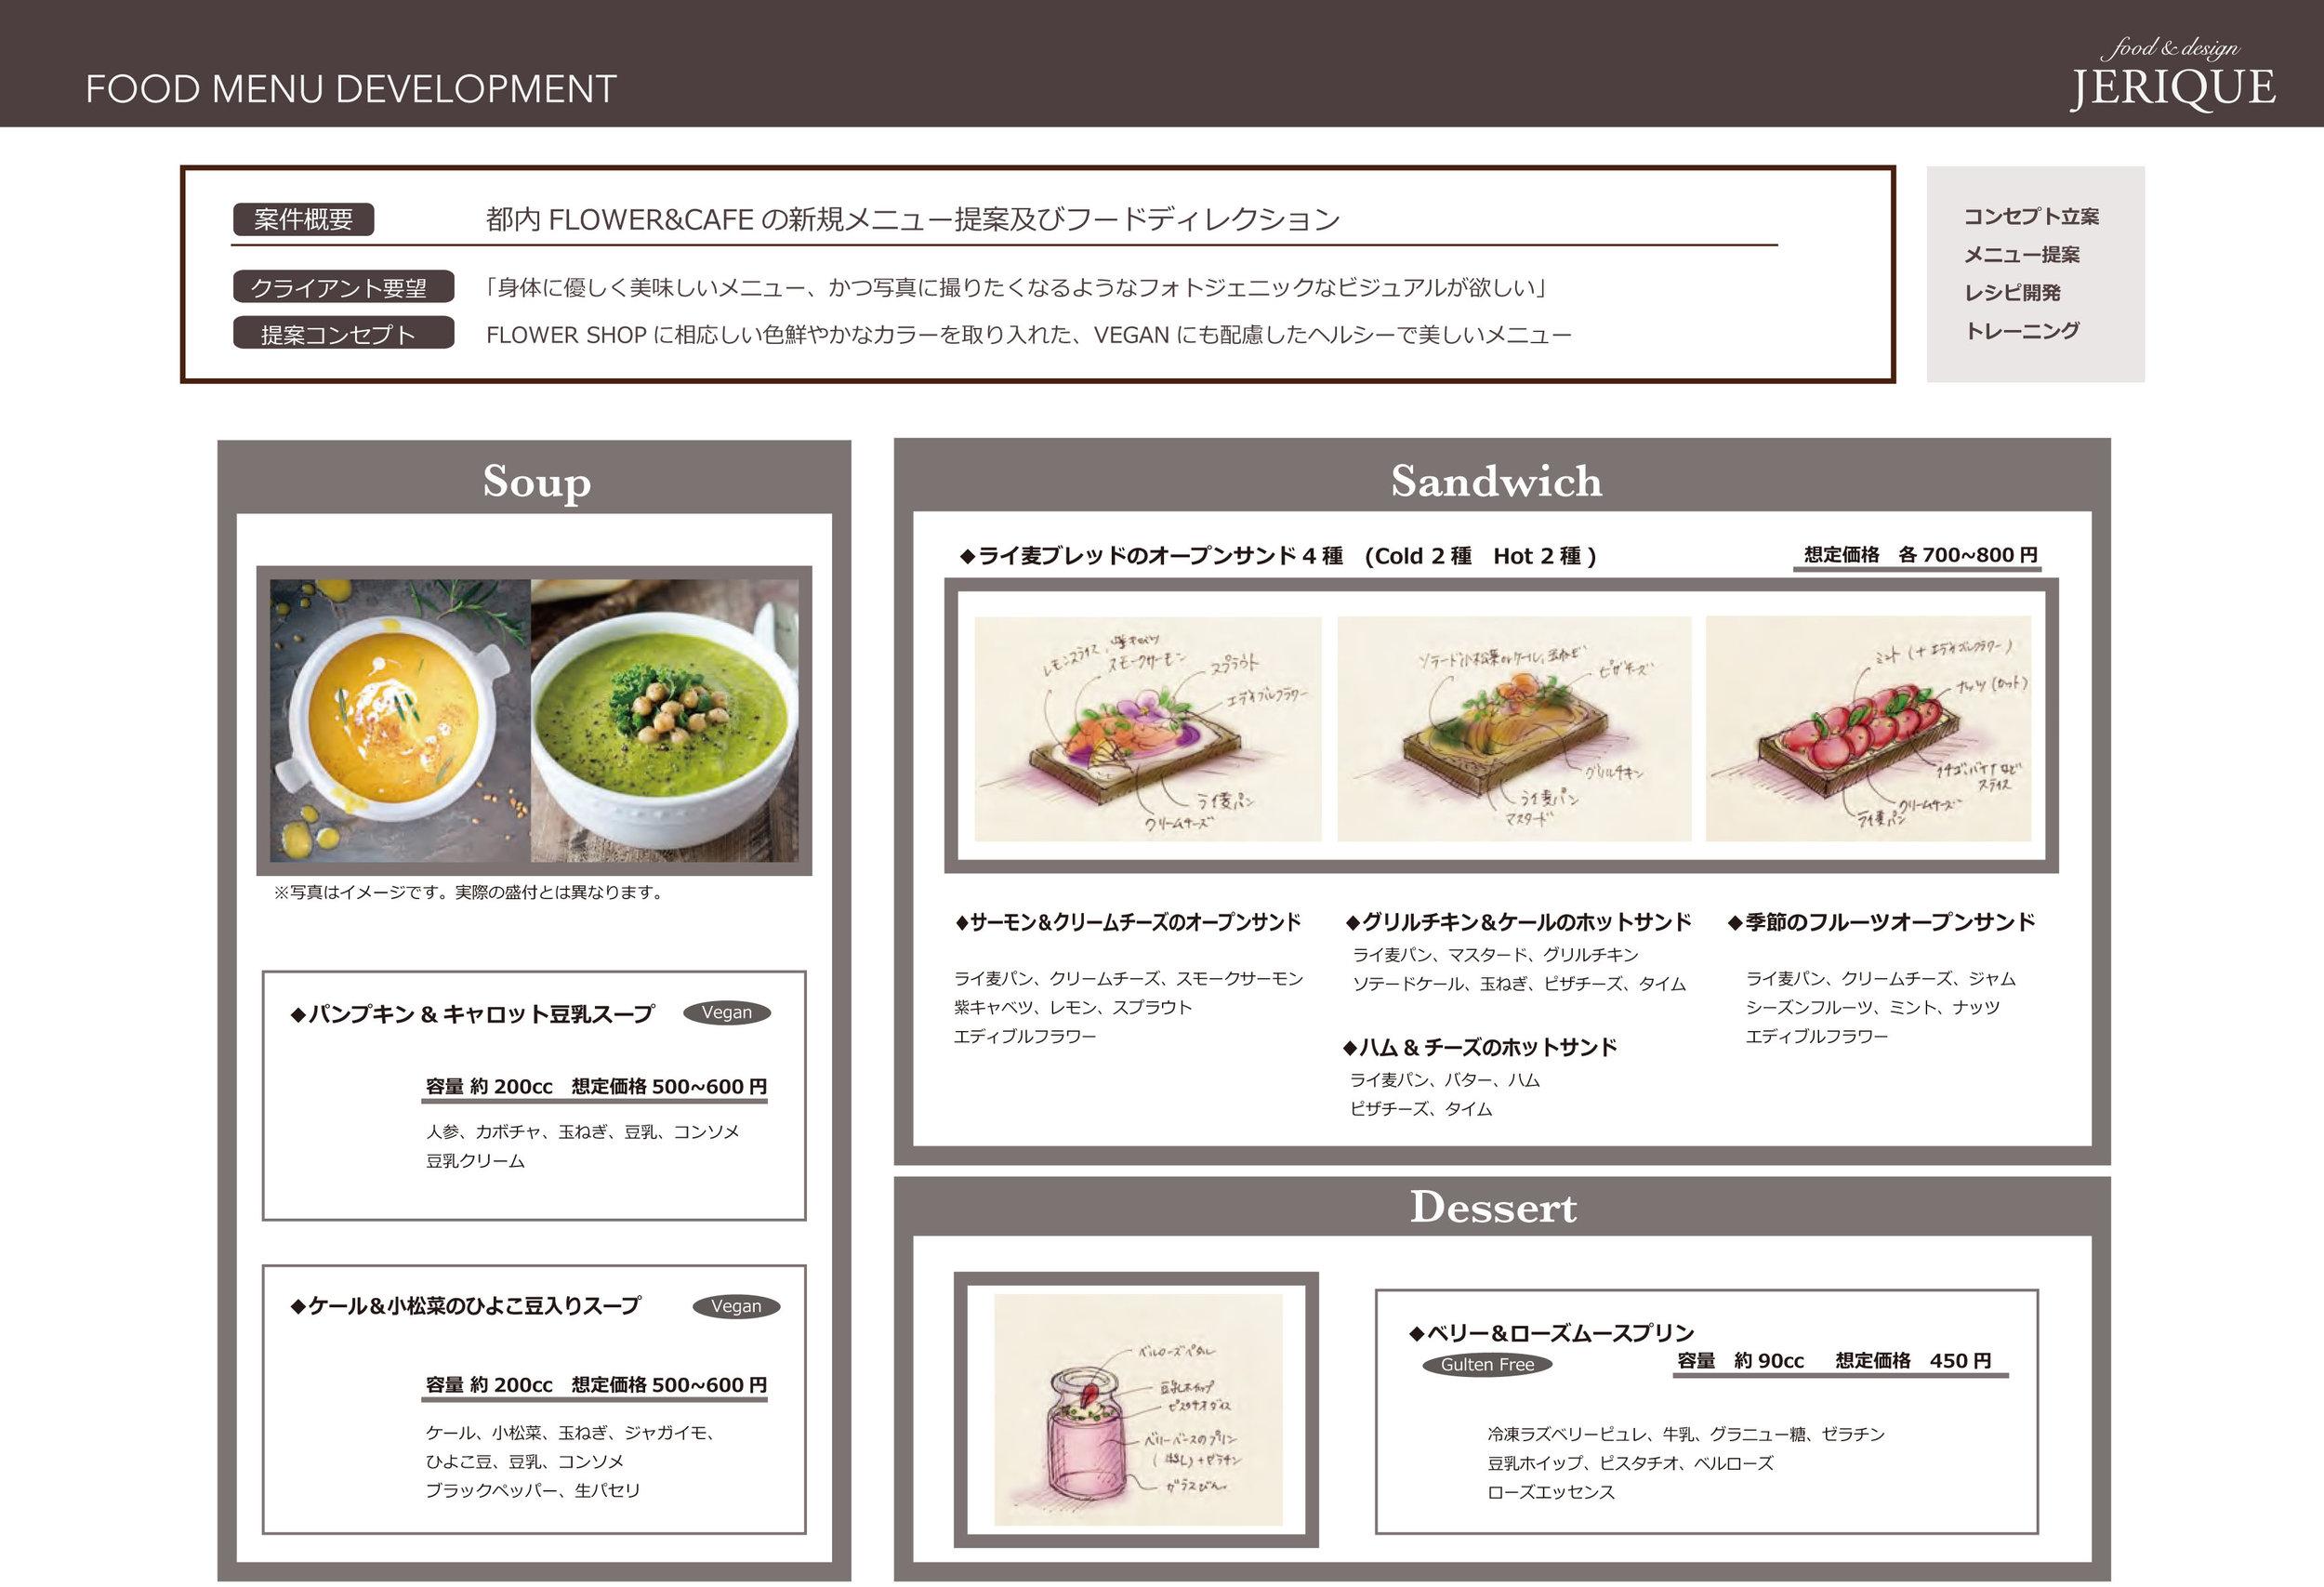 JERIQUE_FOOD DEVELOPMENT-3.jpg